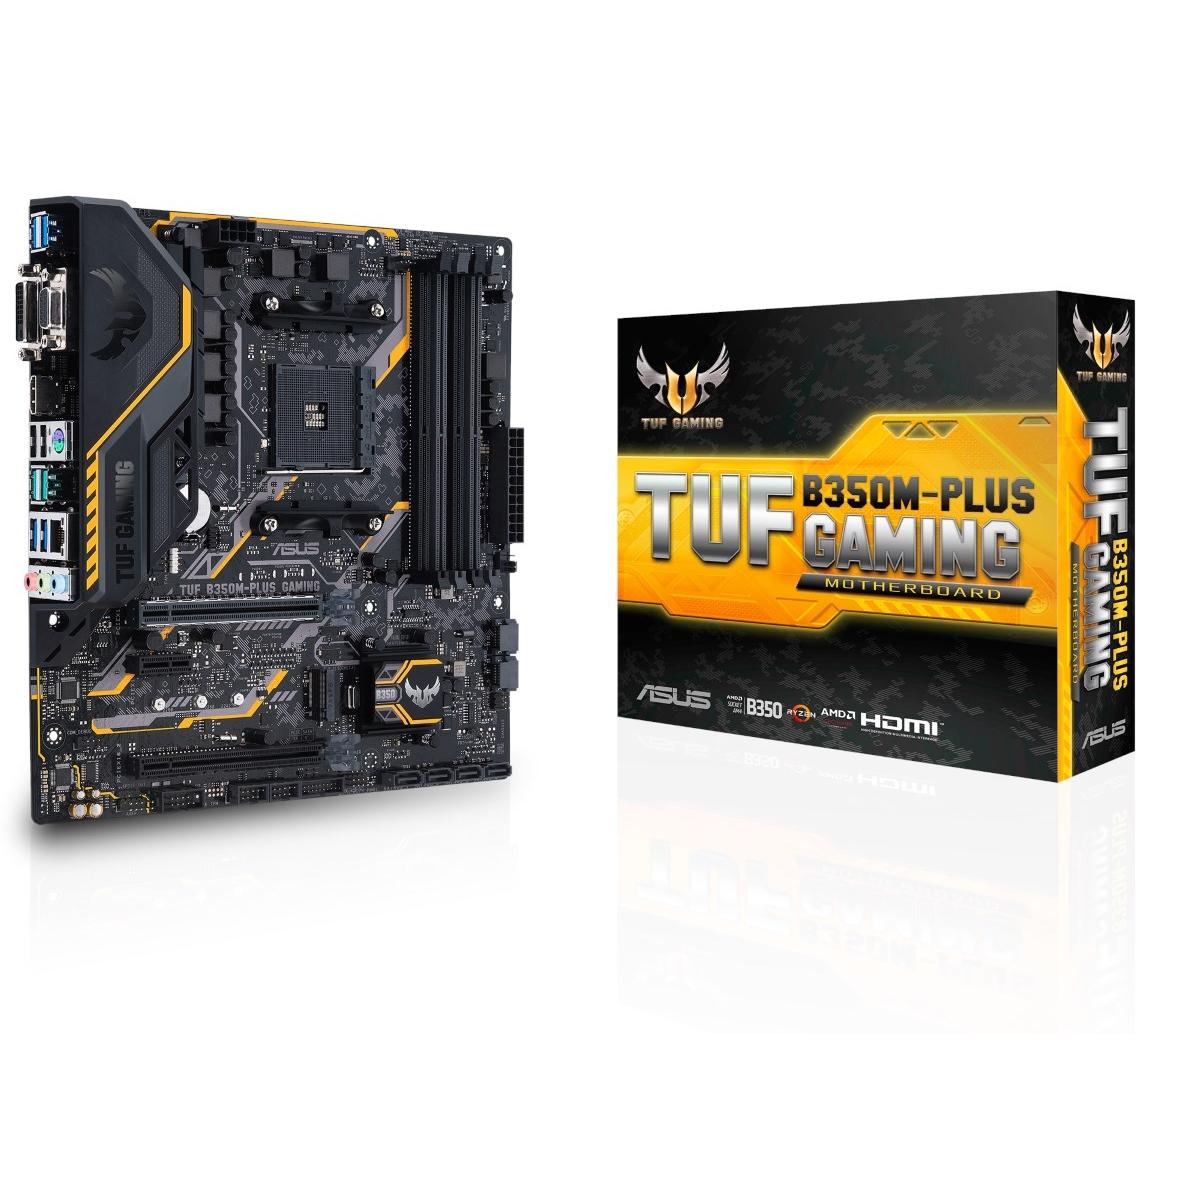 Placa Mãe Asus TUF B350M-PLUS GAMING, Chipset B350, AMD AM4, mATX, DDR4